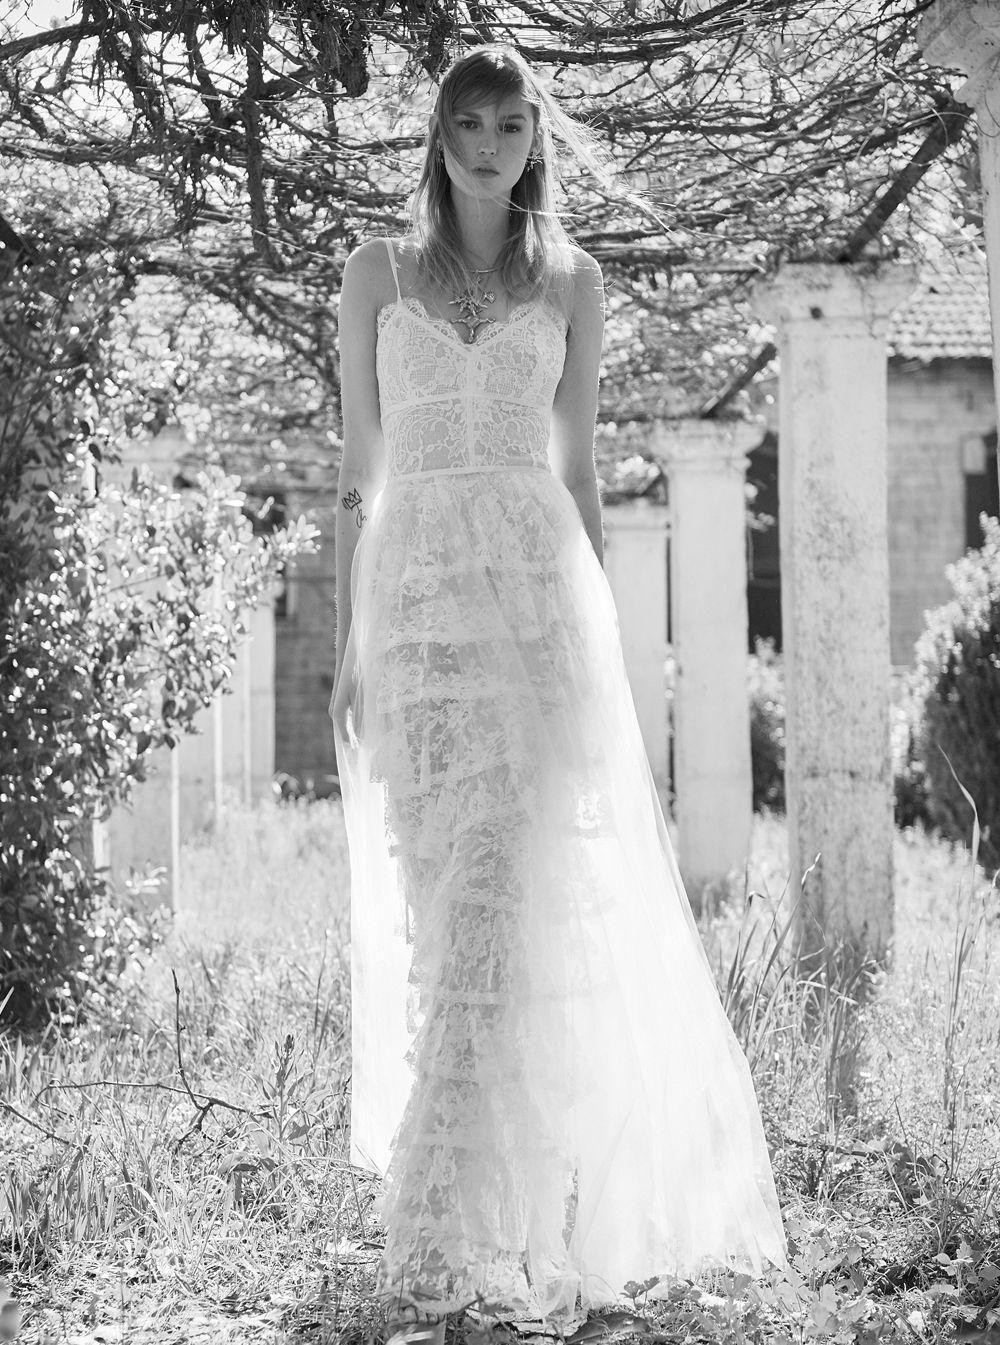 Costarellos bridal spring collectionucbr uebr ucbr ueflair